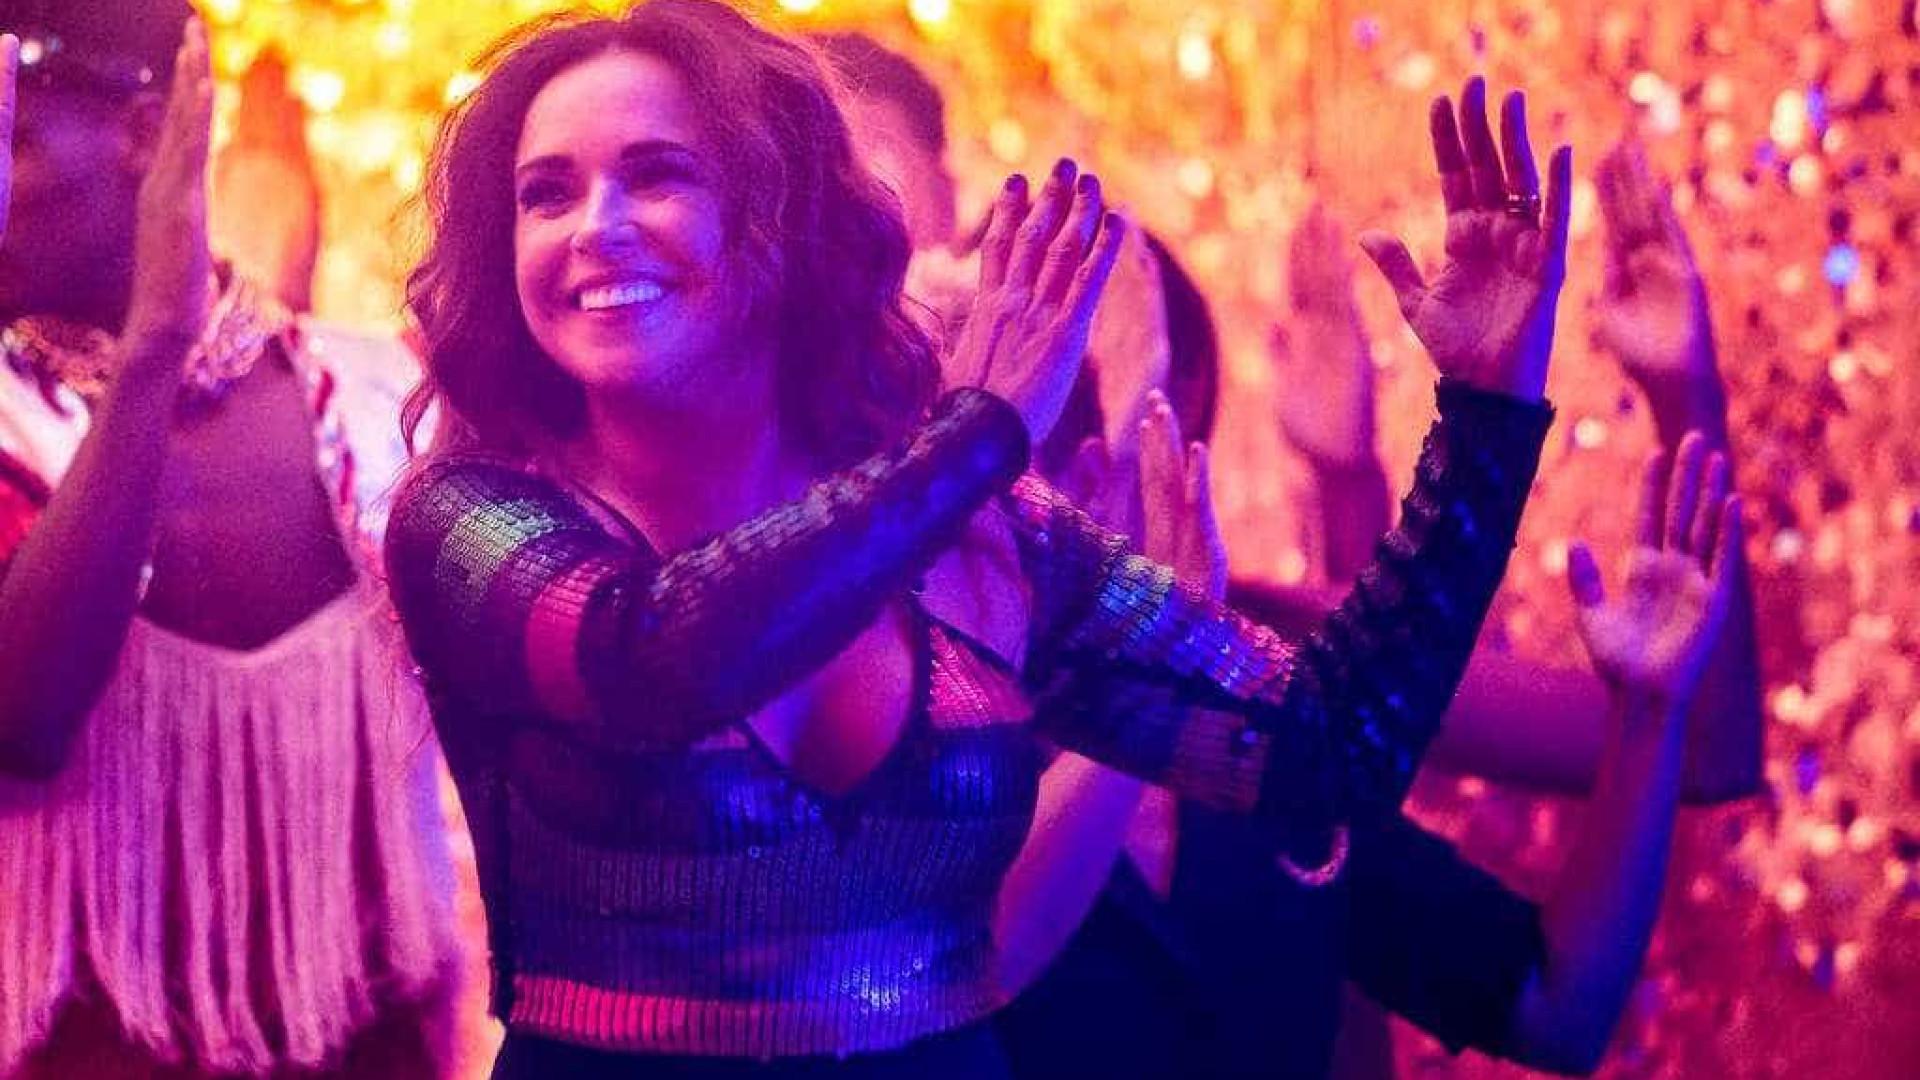 Clipe de Daniela Mercury contra 'rosa e azul' tem 133 mil dislikes